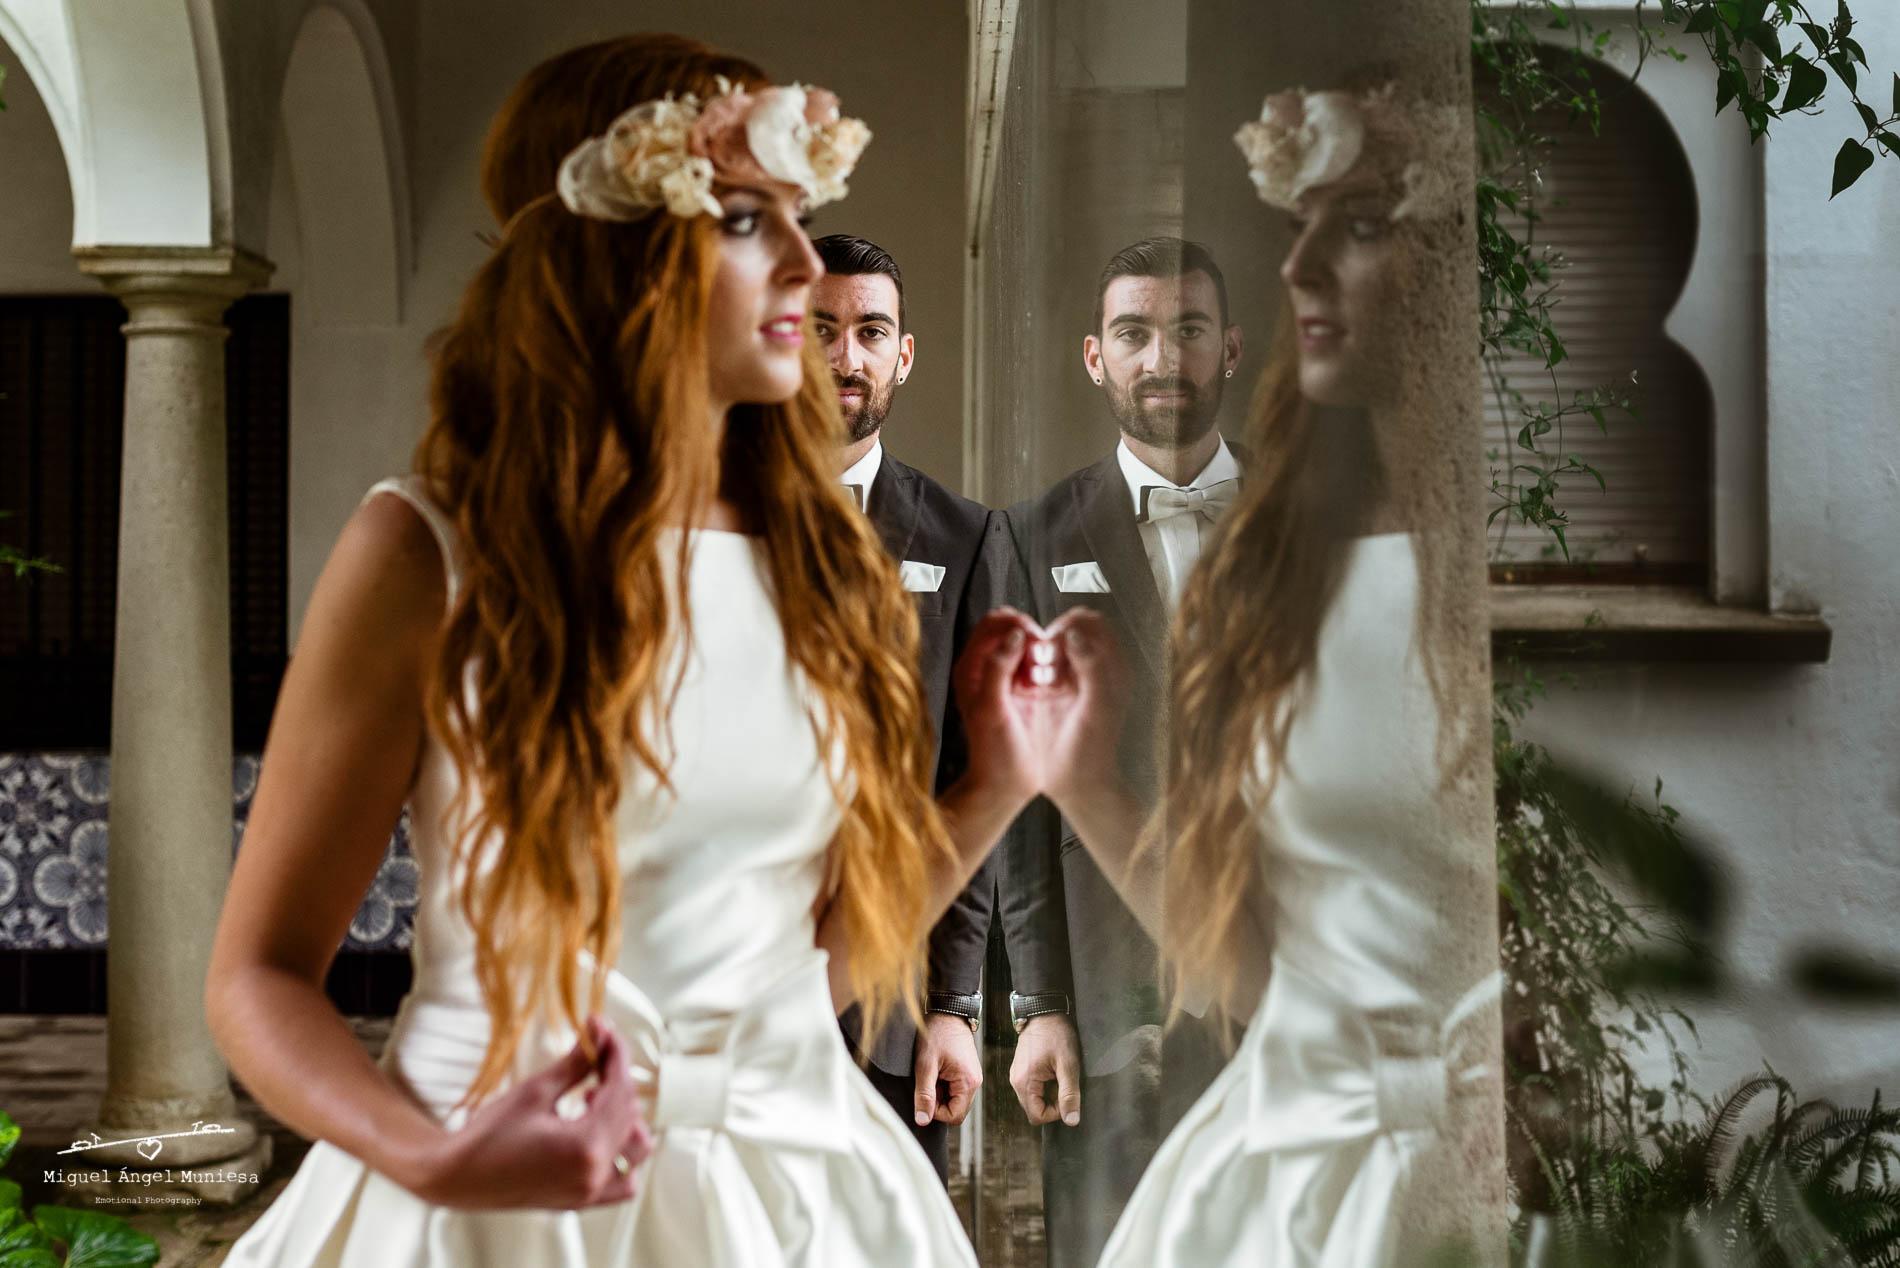 boda, fotografia de boda, boda zaragoza, fotografia, wedding, wedding photography, miguel angel muniesa, fotografo boda Zaragoza, fotografo boda, destination wedding_ 0011